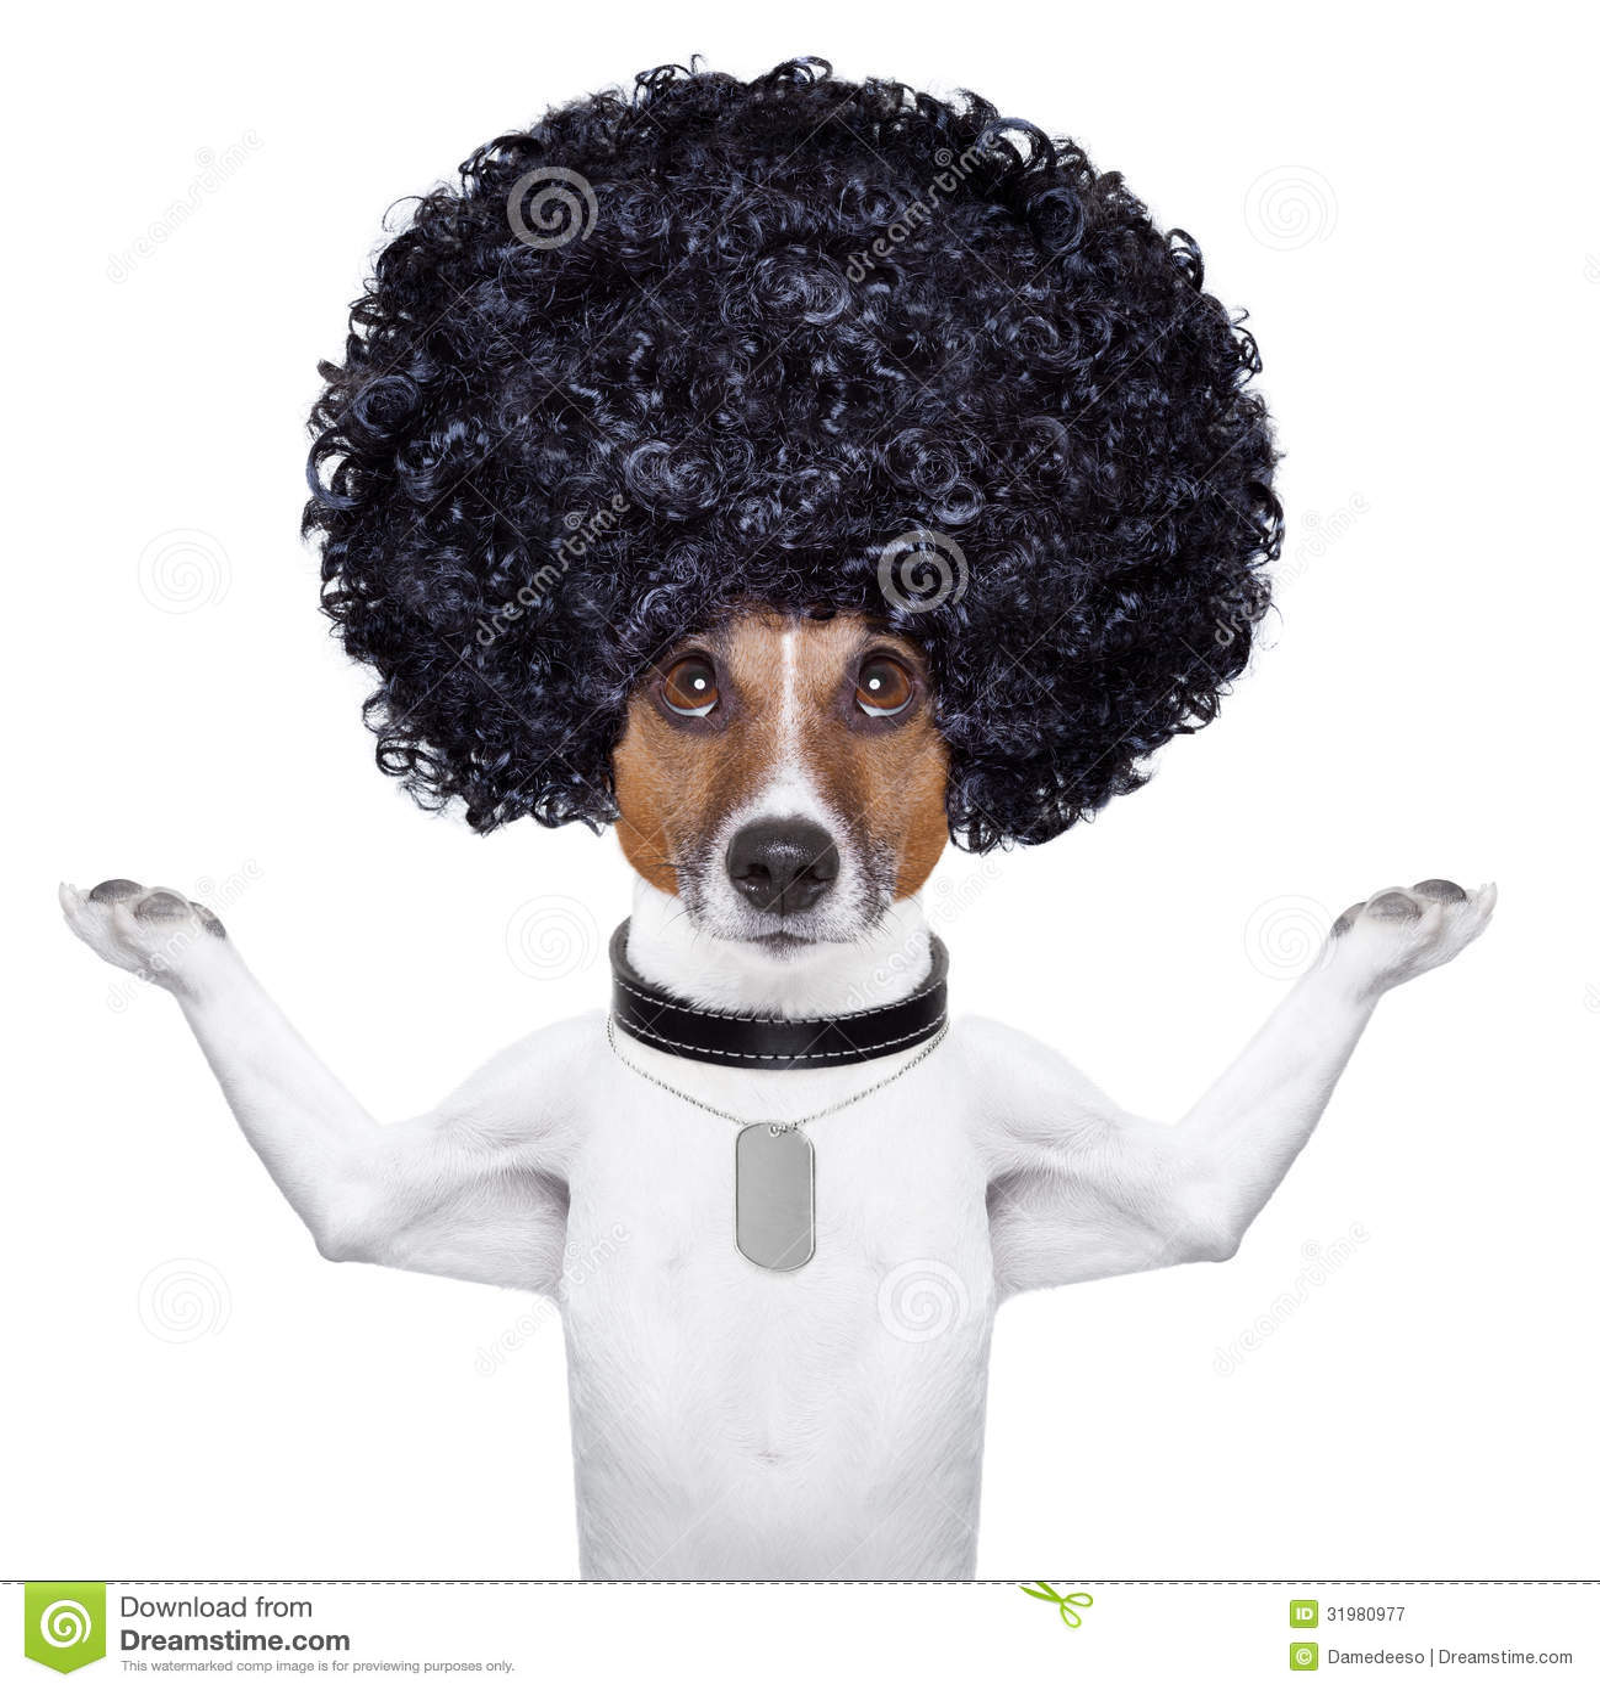 Black Dog Wig